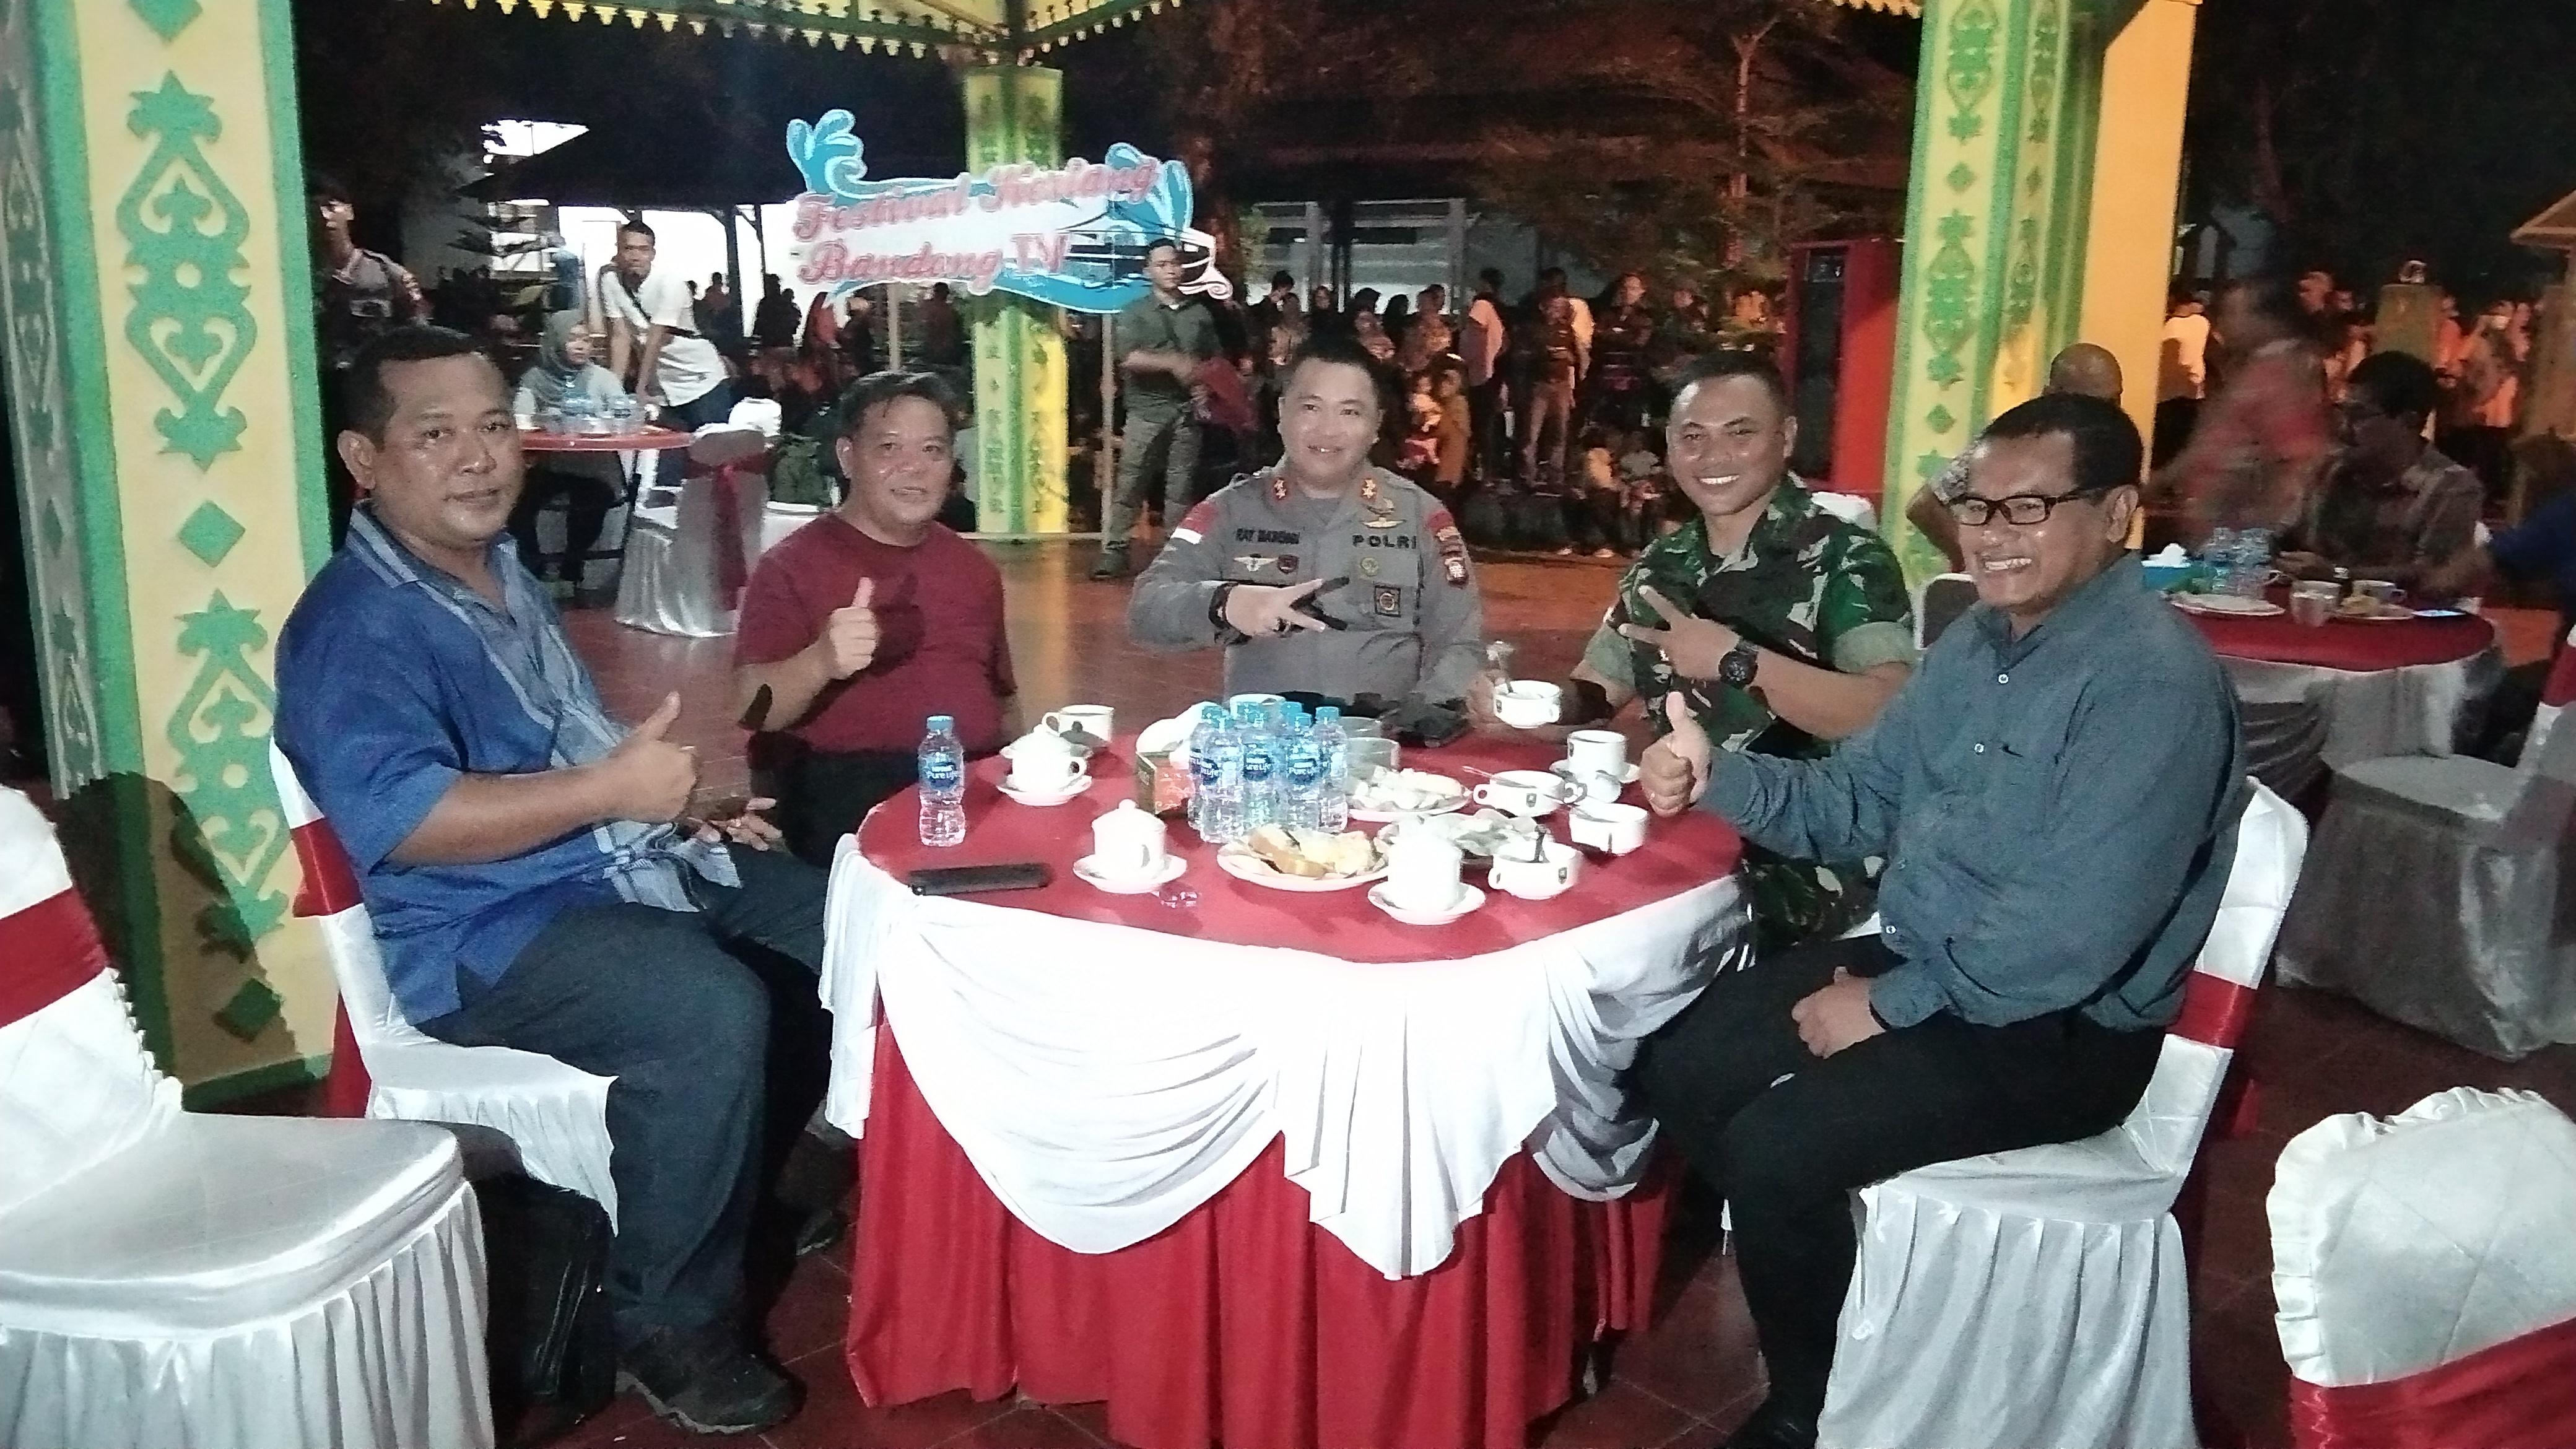 FESTIVAL KERIANG BANDONG MENGIRINGI PERGANTIAN TAHUN KAB. SANGGAU